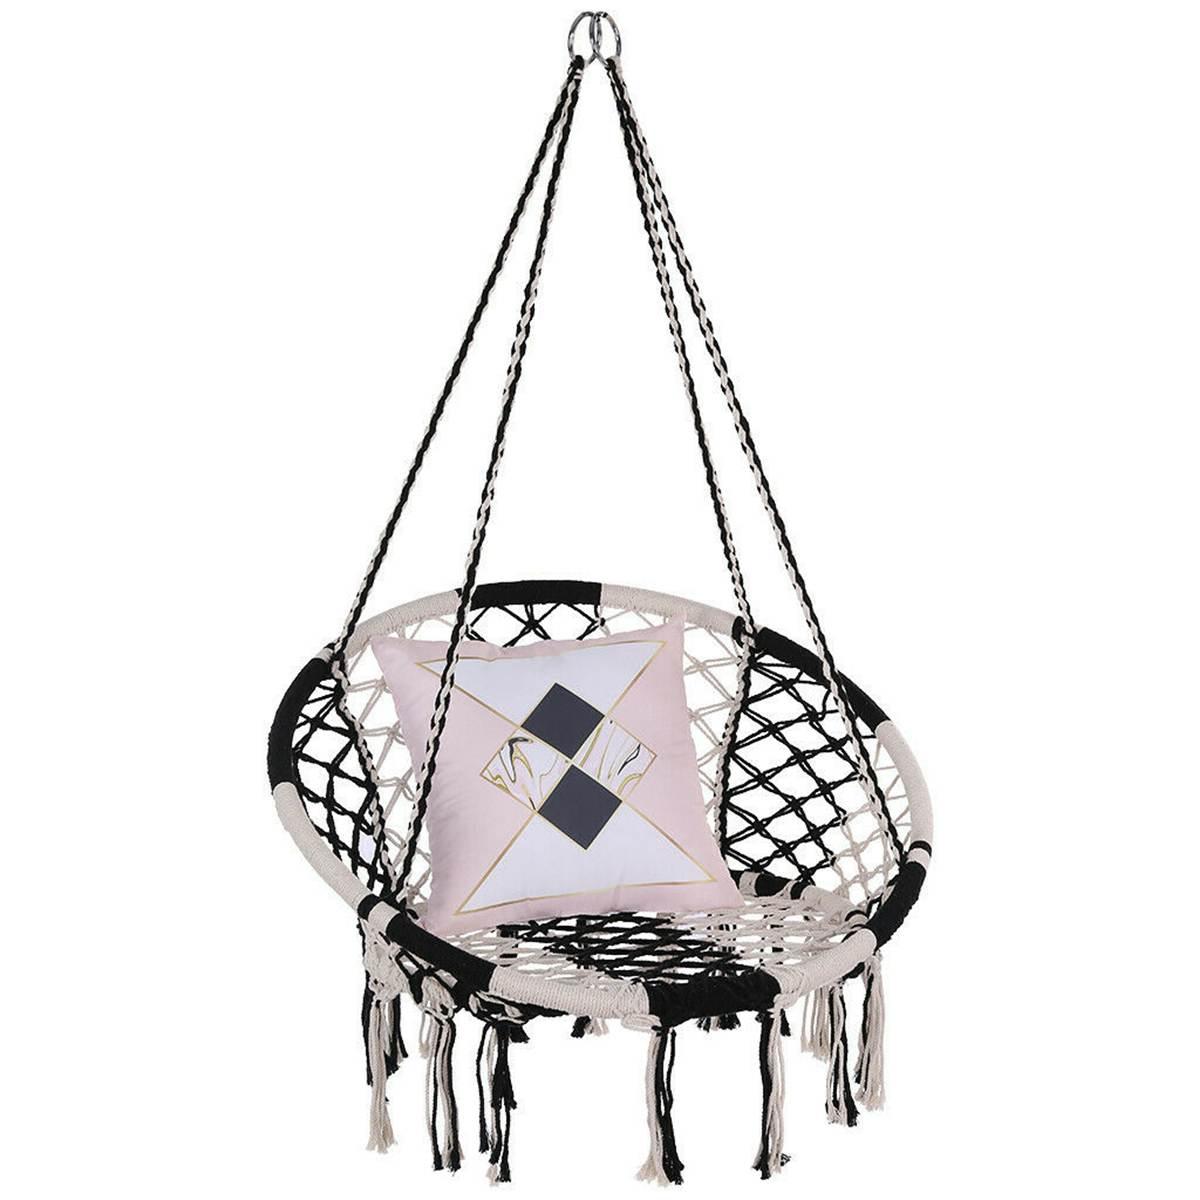 Round Hammock Round Hammock Swing Hanging Chair Outdoor Indoor Furniture Hammock Chair for Garden Dormitory Child Adult